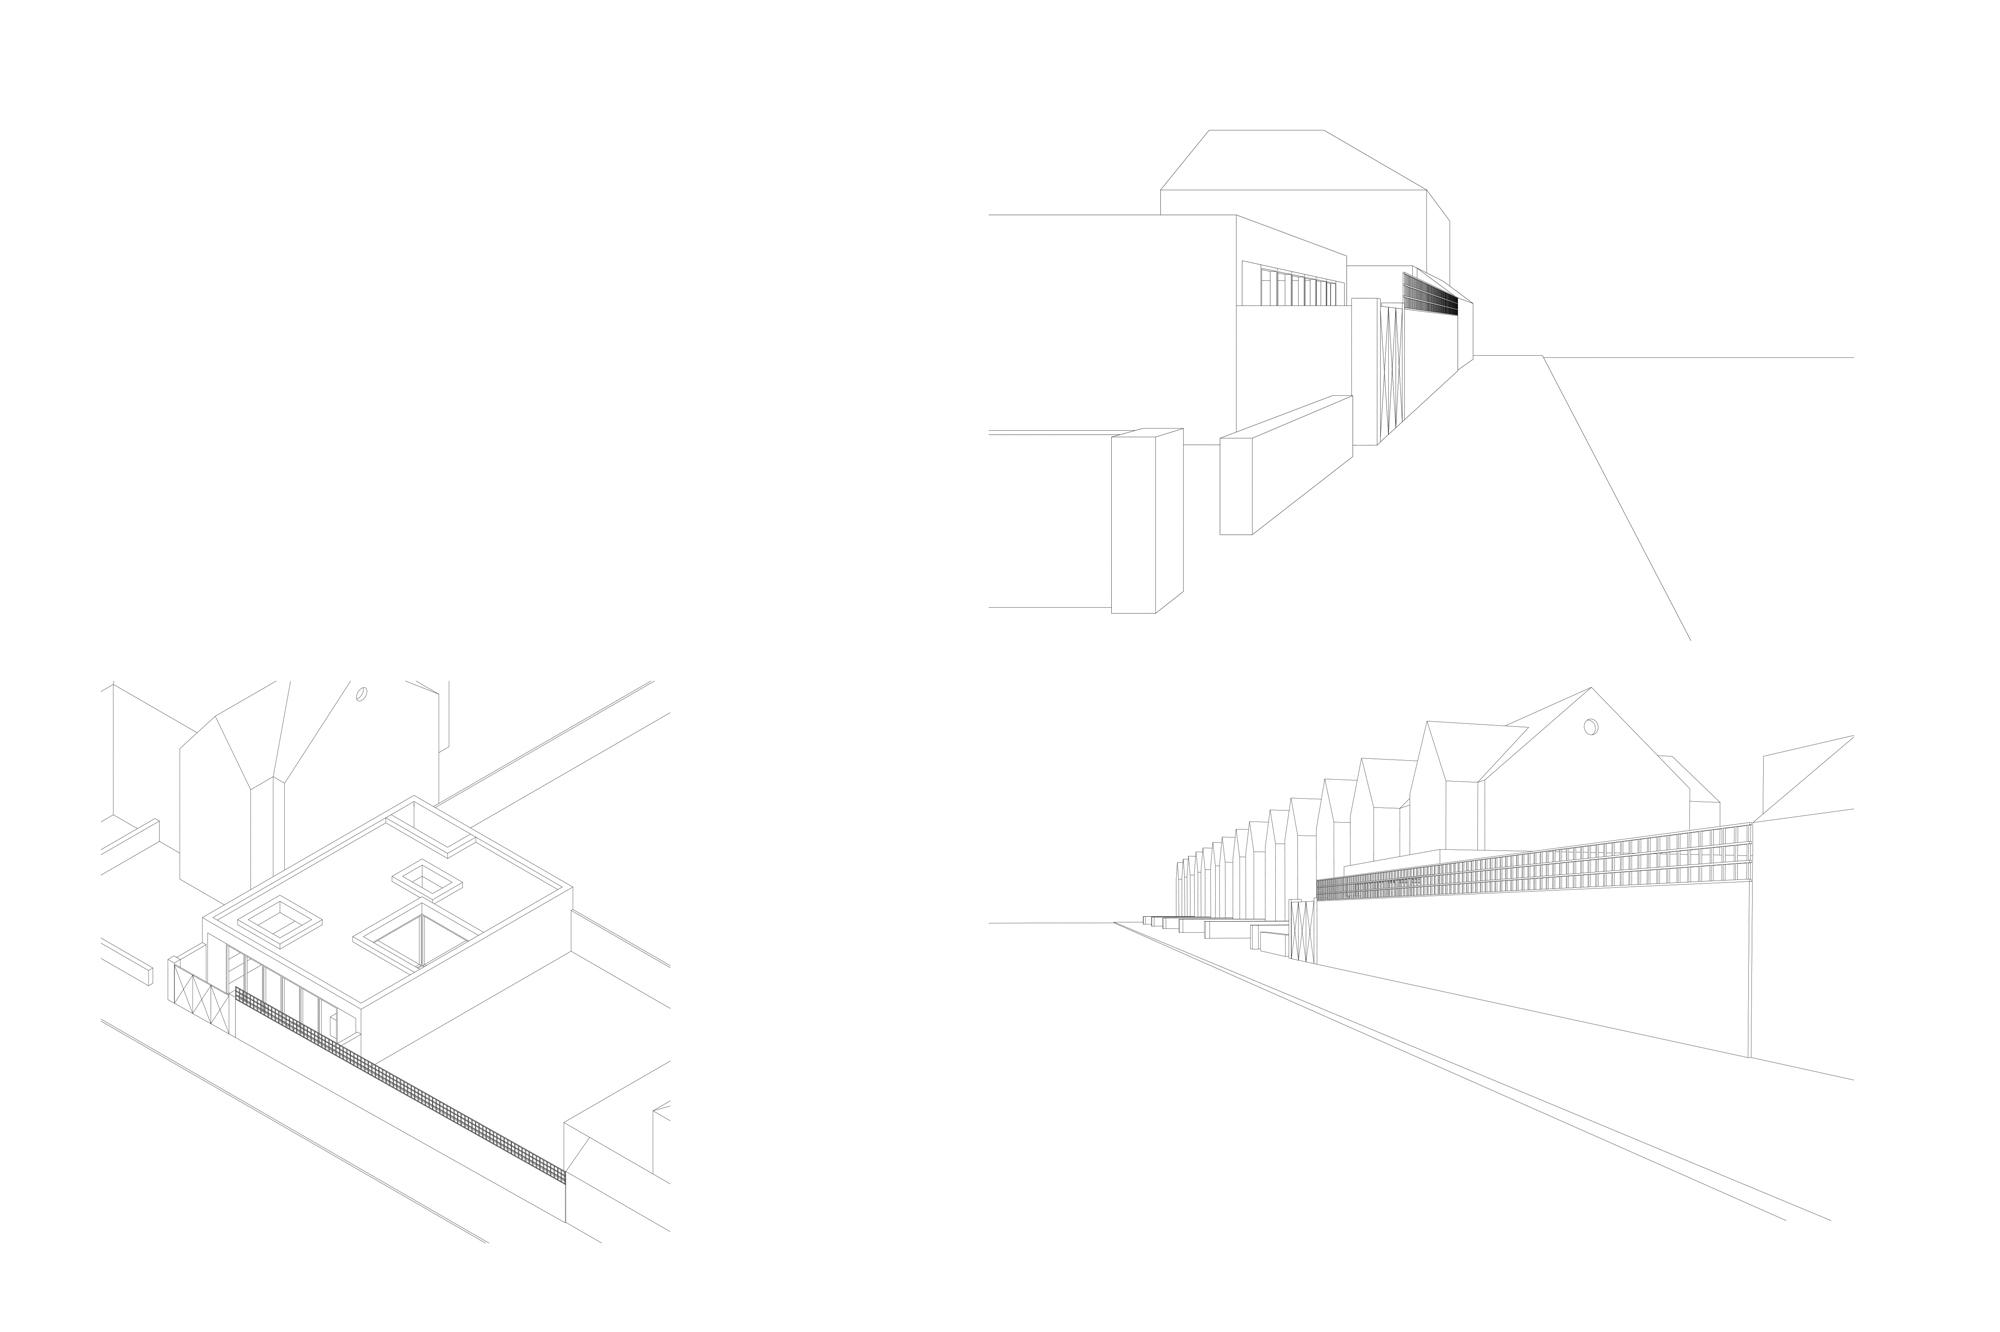 cube-haus-carl-turner-w3-cs-2000×1332-02